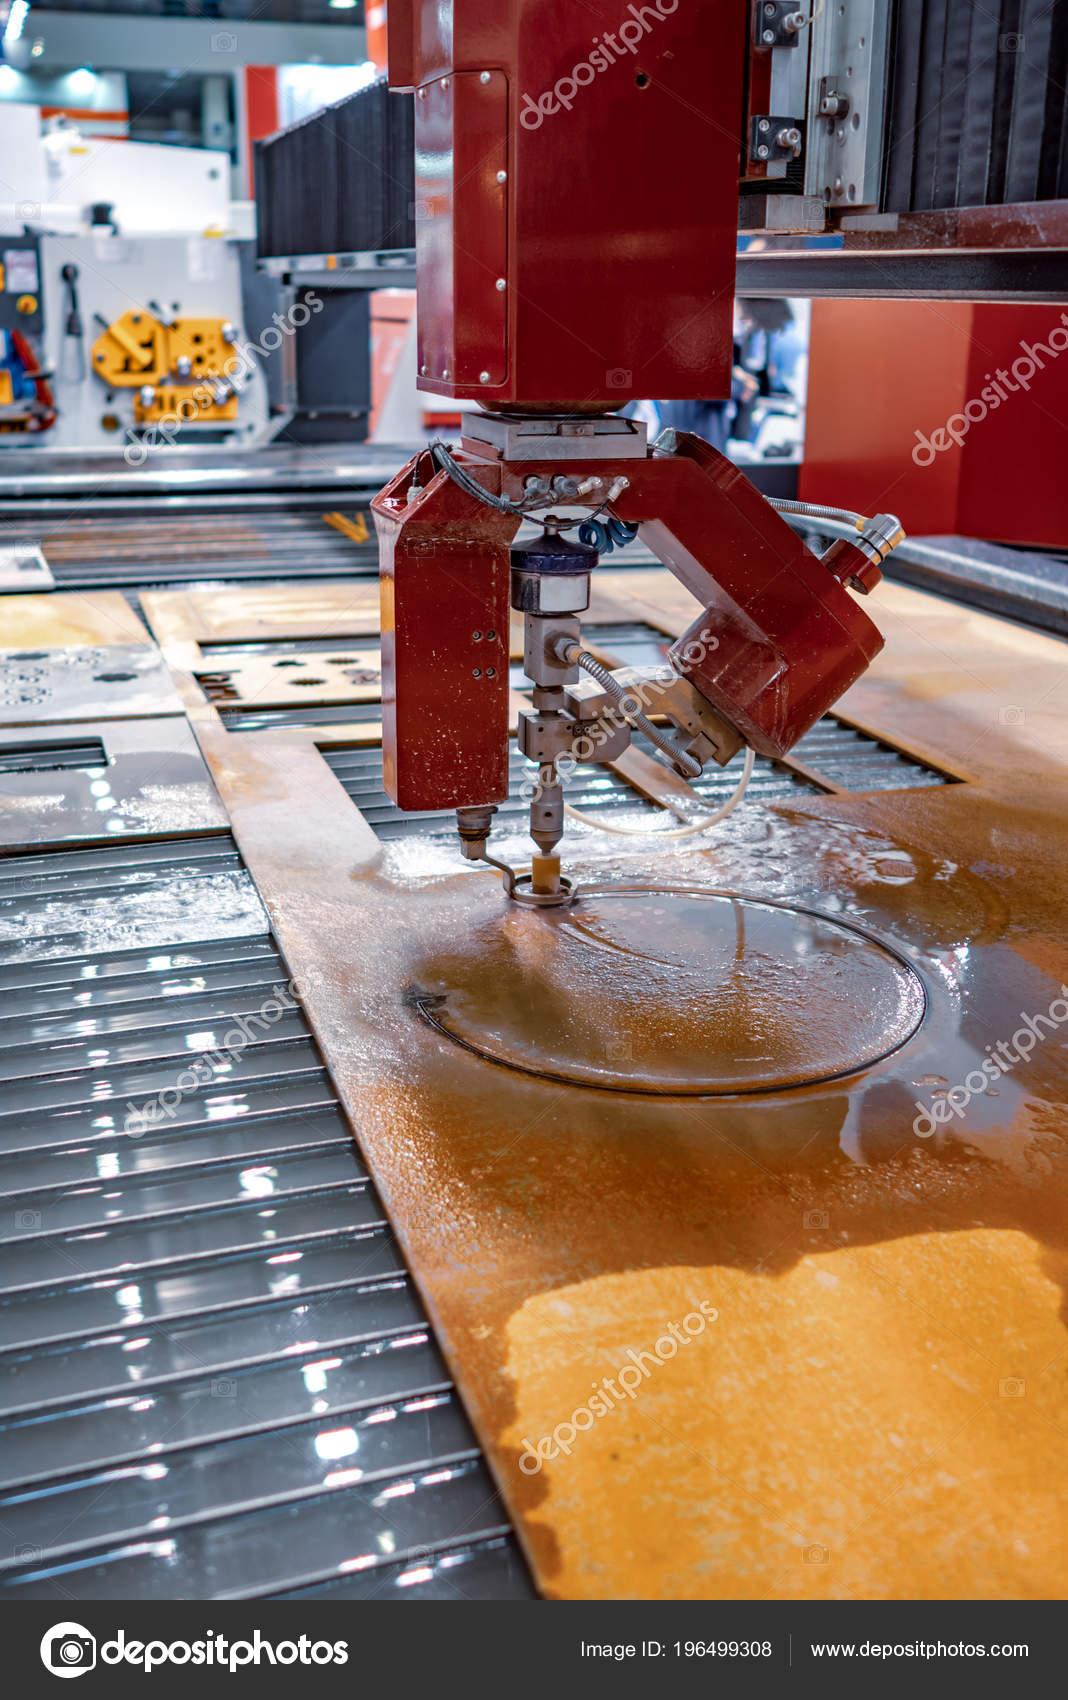 Cnc Water Jet Cutting Machine Modern Industrial Technology — Stock